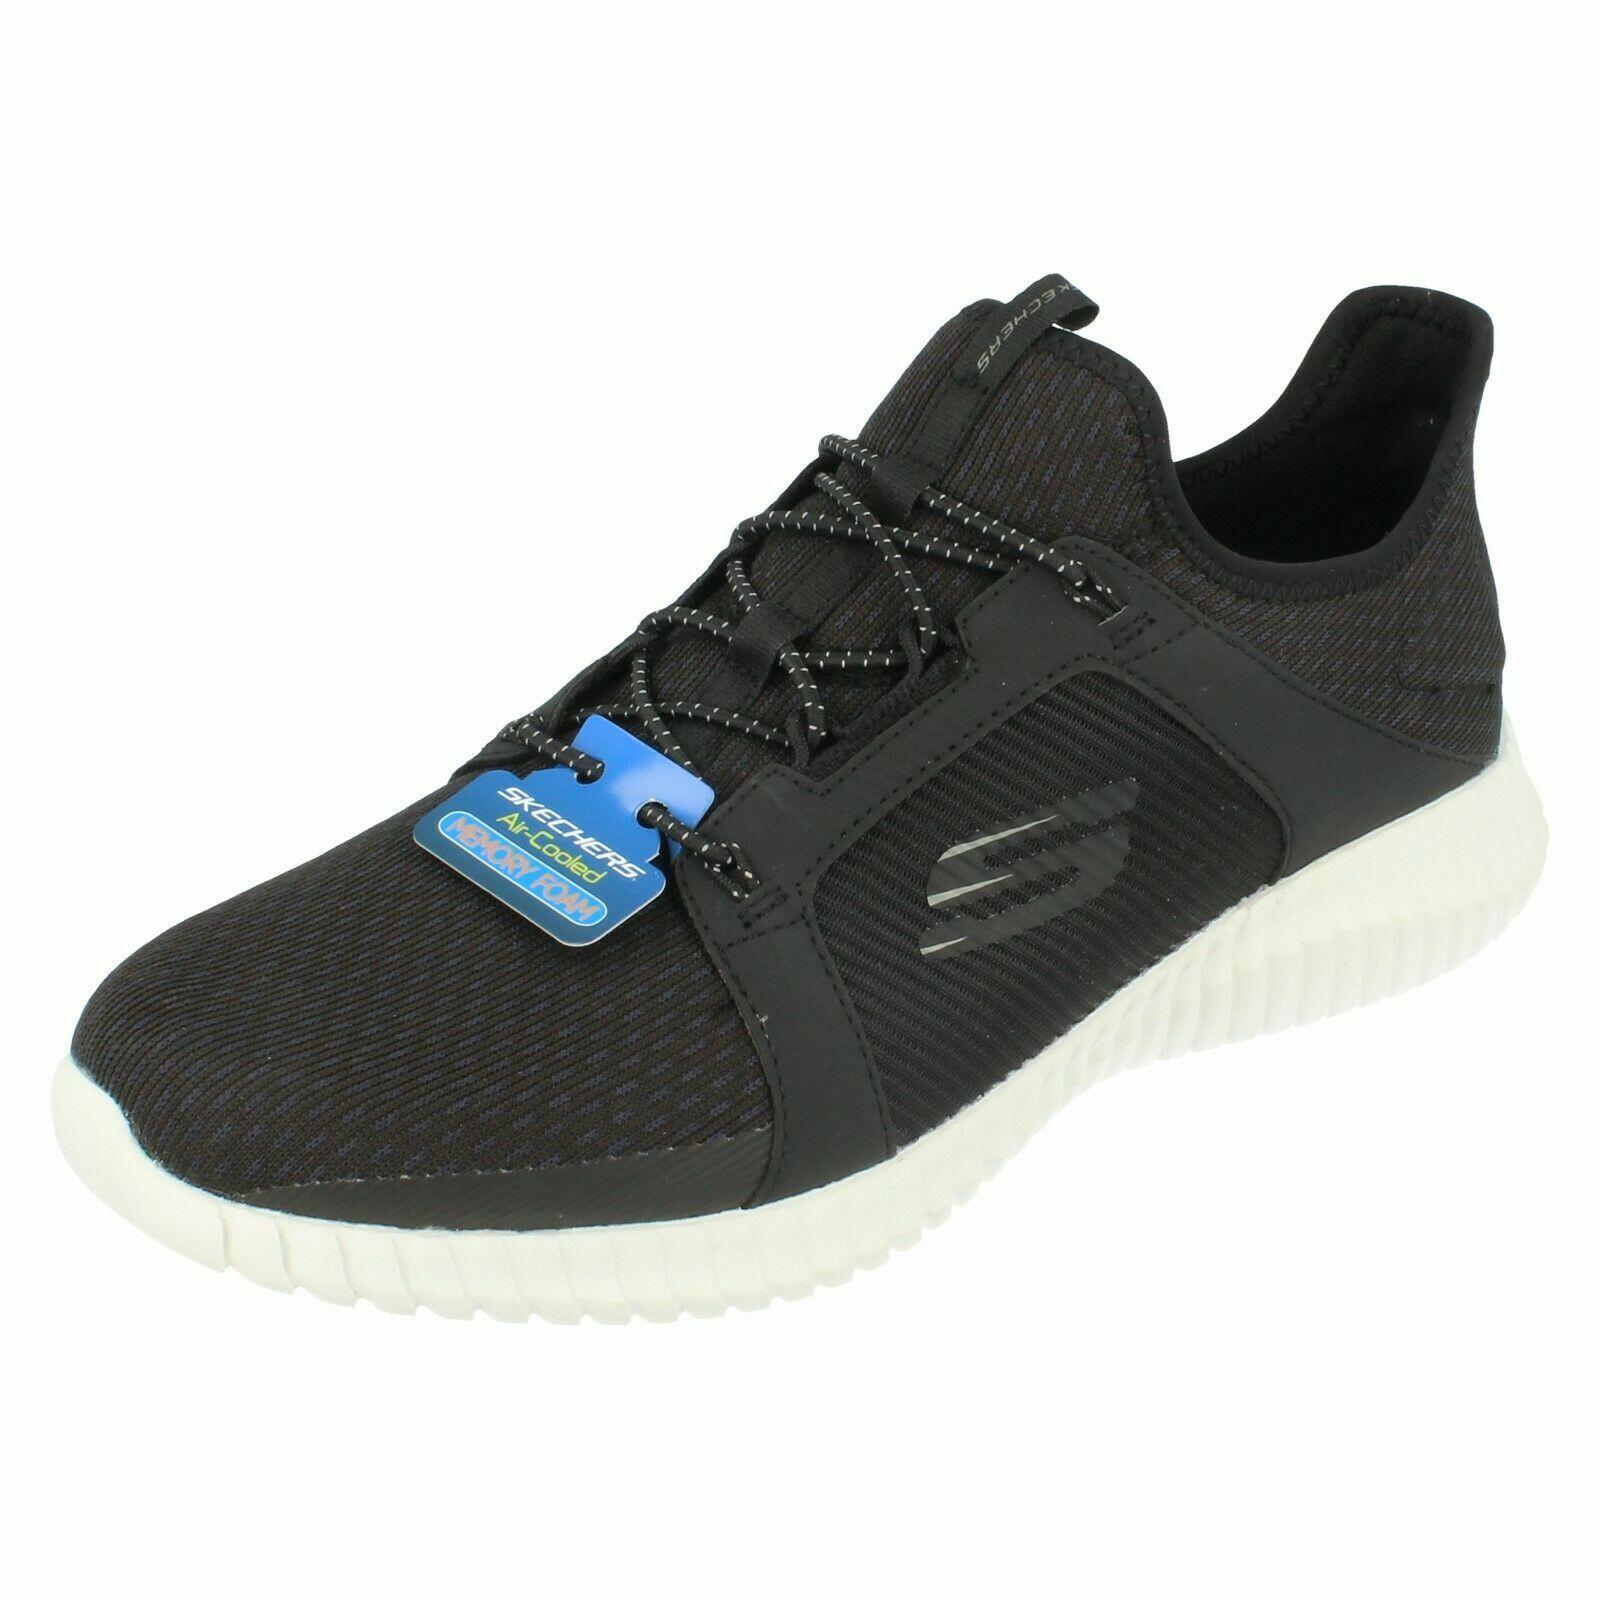 Anual lanzar proteger  Mens Skechers Elite Flex - 52640 Lace Up Black/ White Trainers for sale  online | eBay